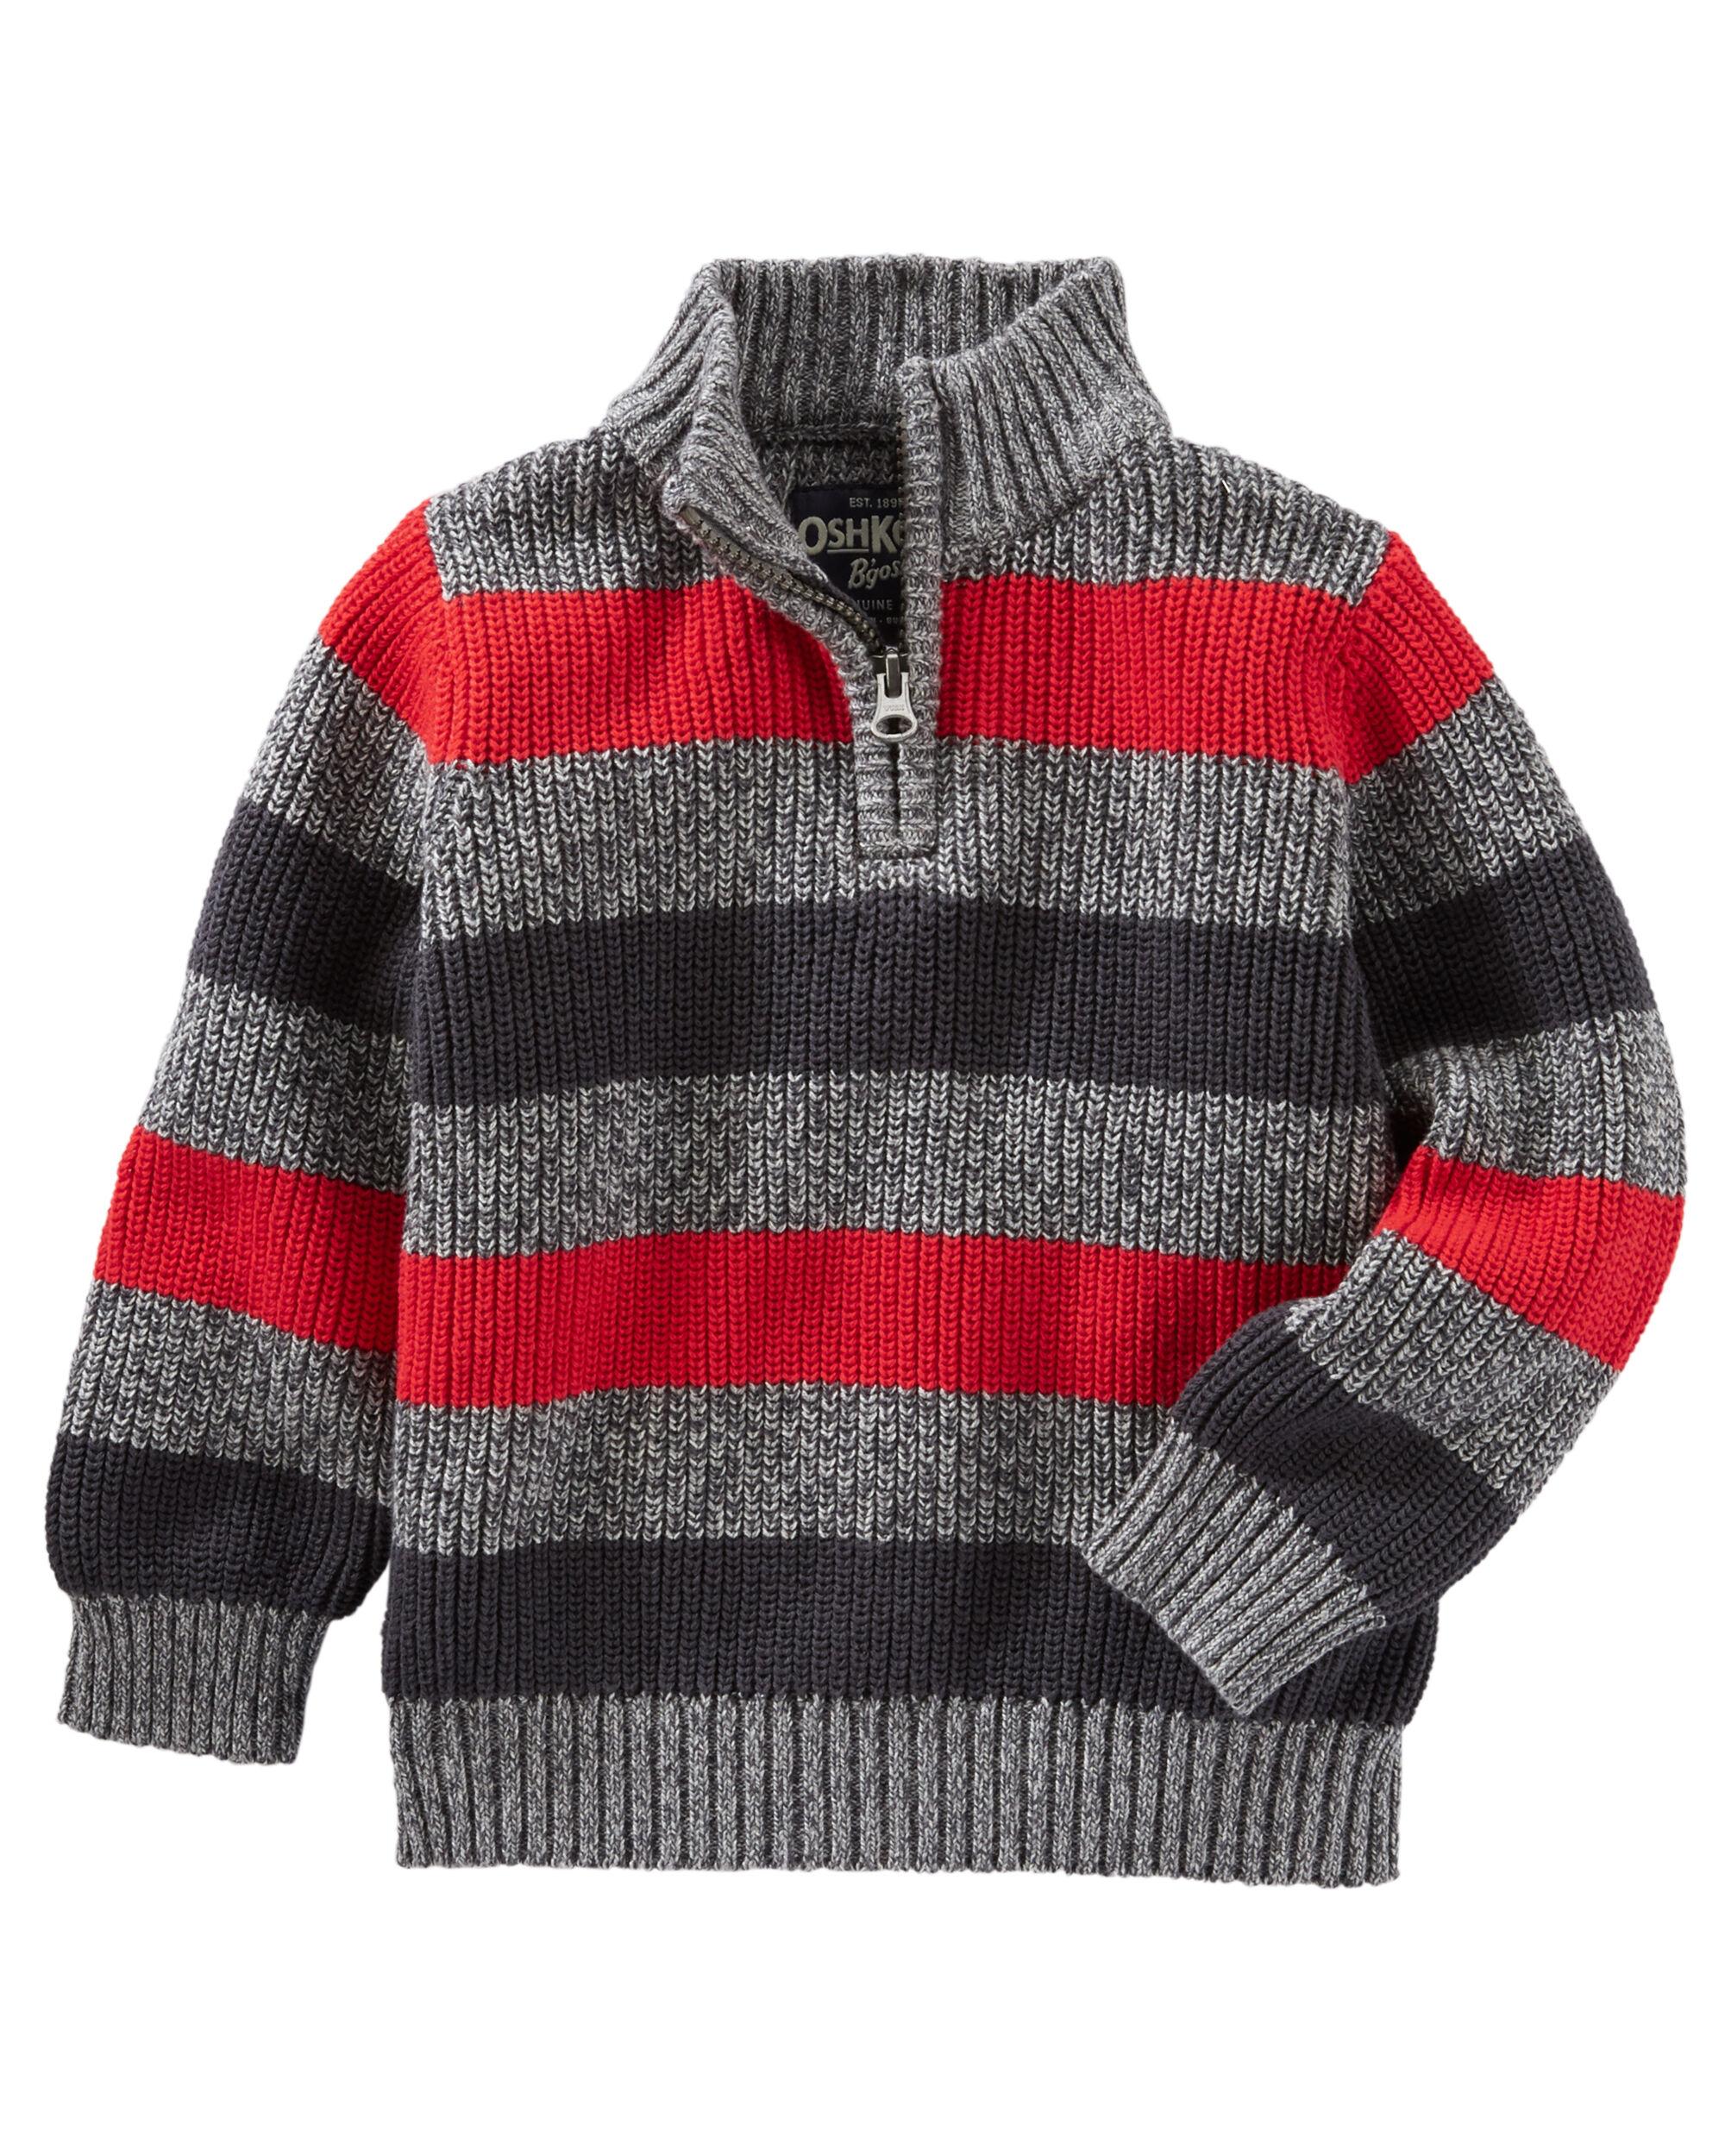 Baby Boy Ski Lodge Sweater Oshkosh Com